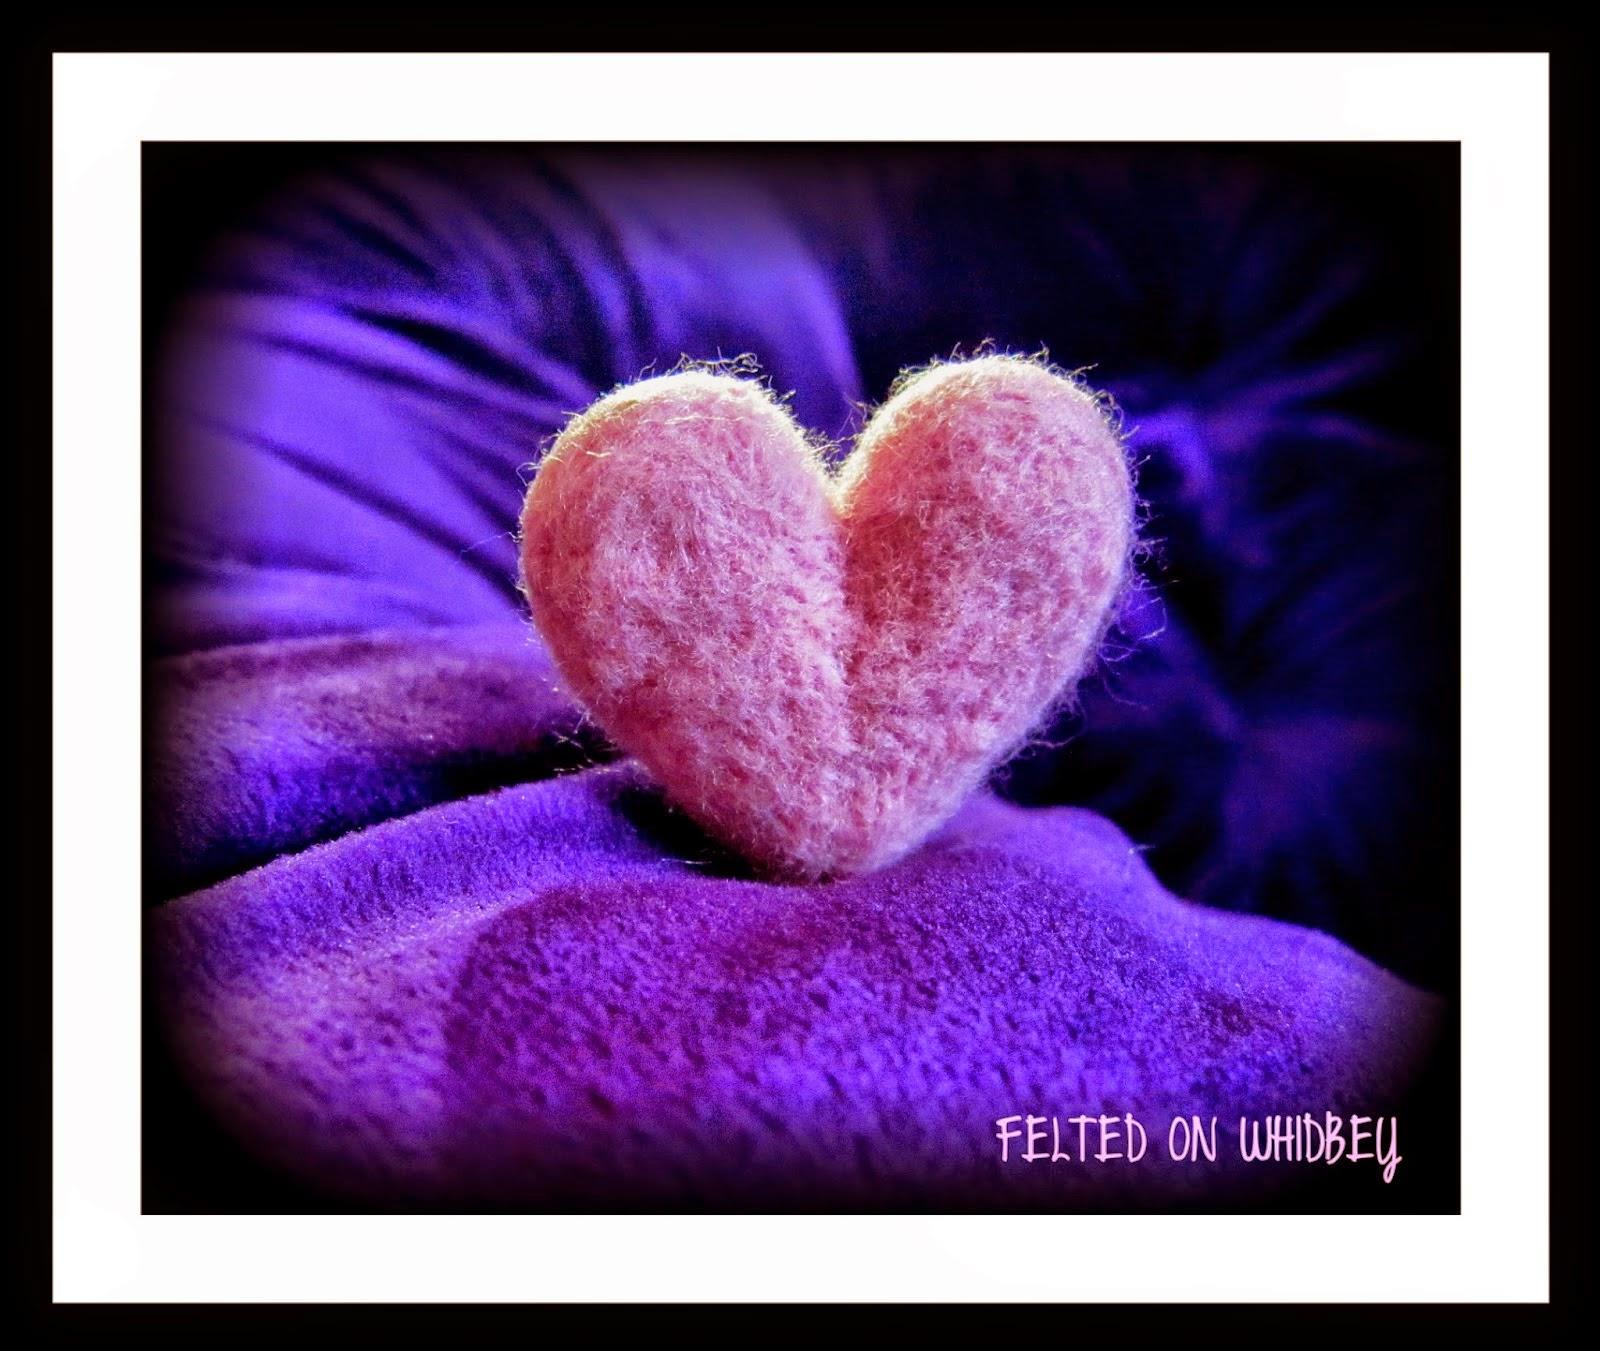 http://feltedonwhidbey.blogspot.com/2014/08/needle-felted-heart.html